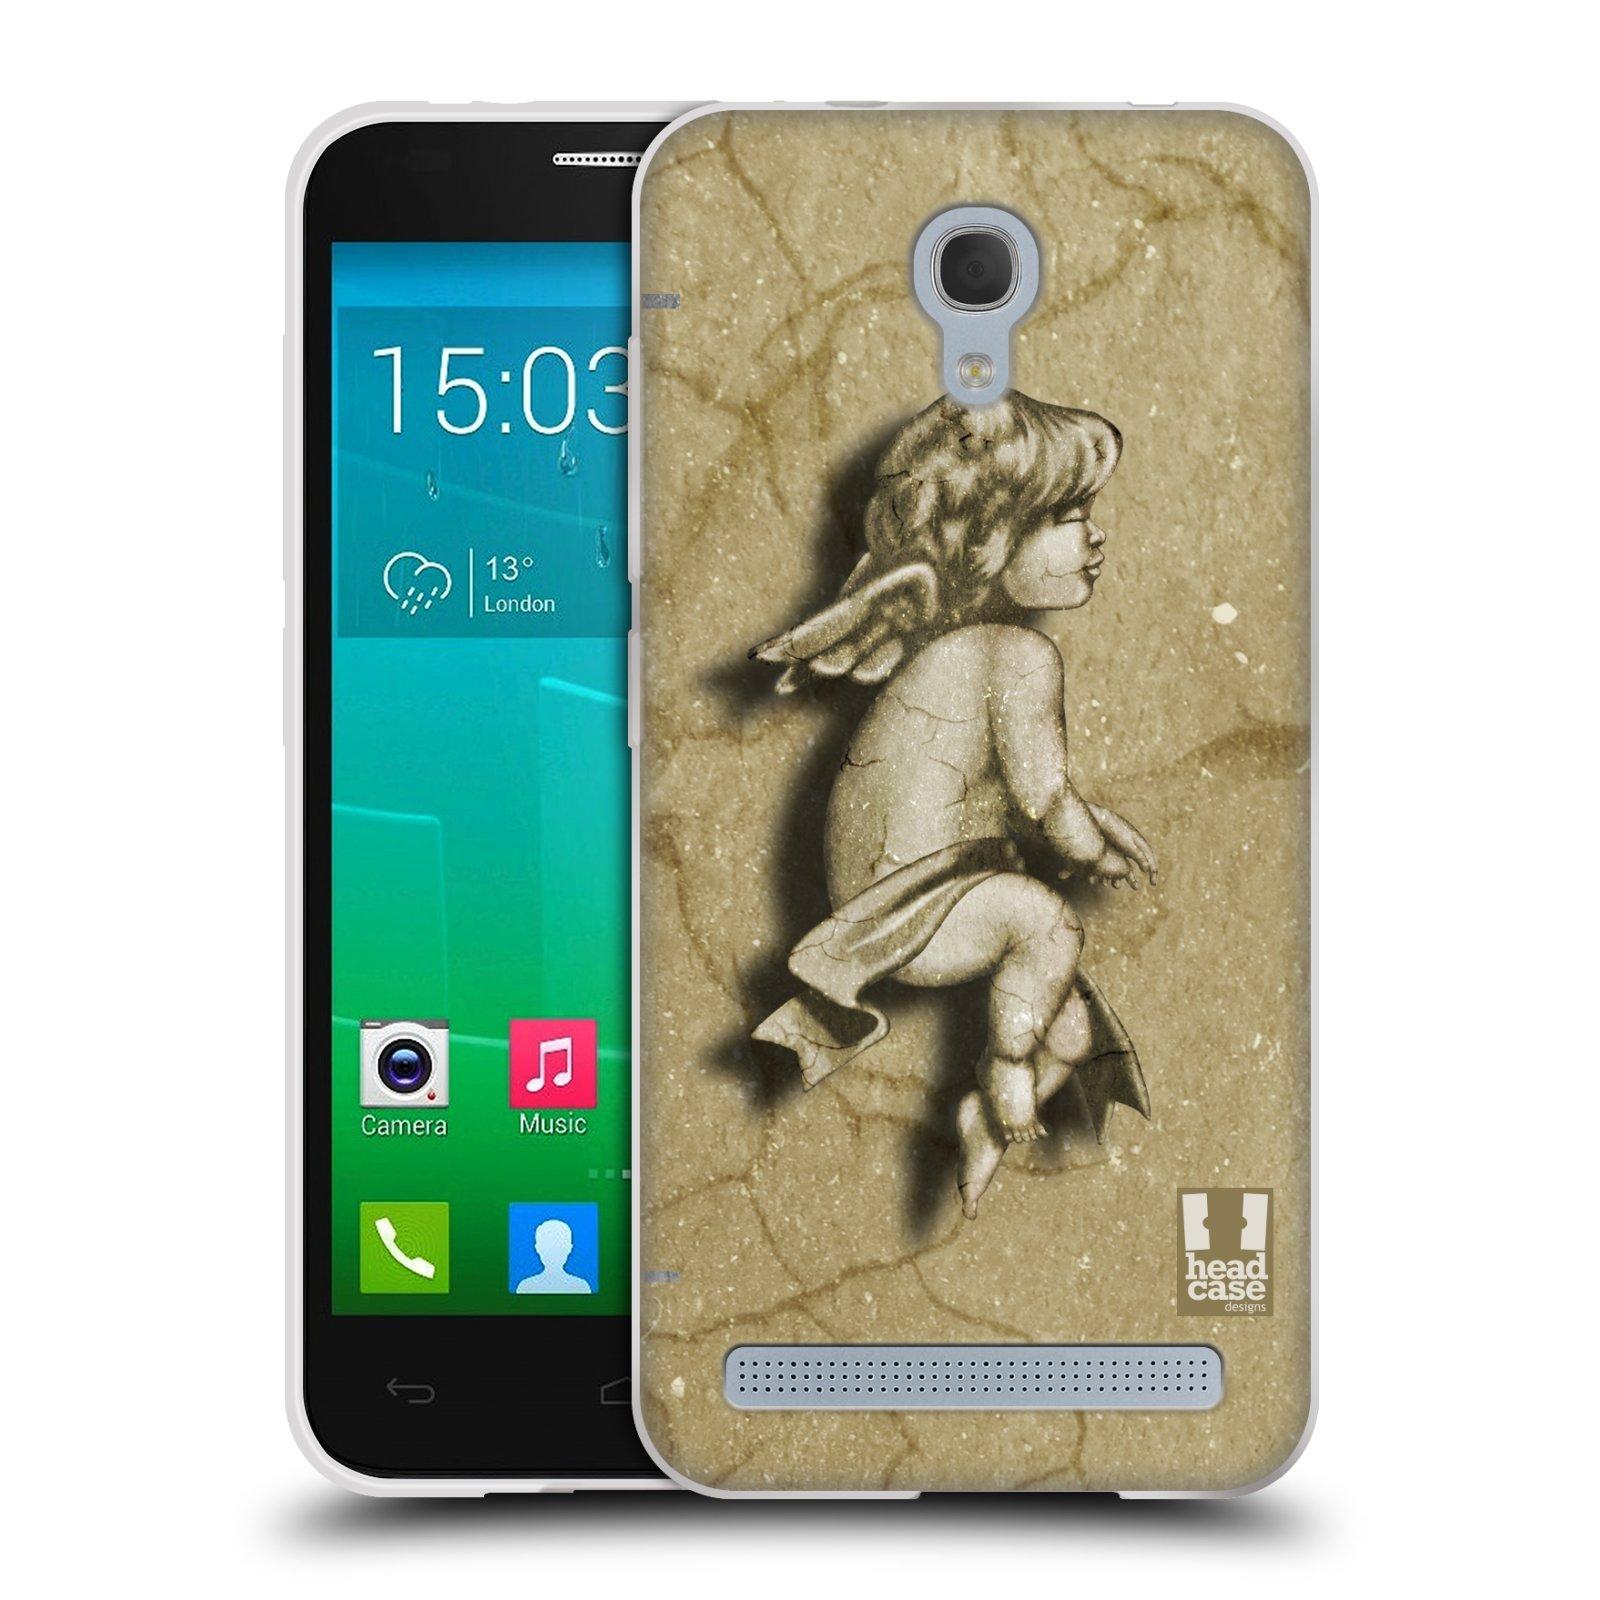 HEAD CASE silikonový obal na mobil Alcatel Idol 2 MINI S 6036Y vzor Andělé z kamene LAZAR